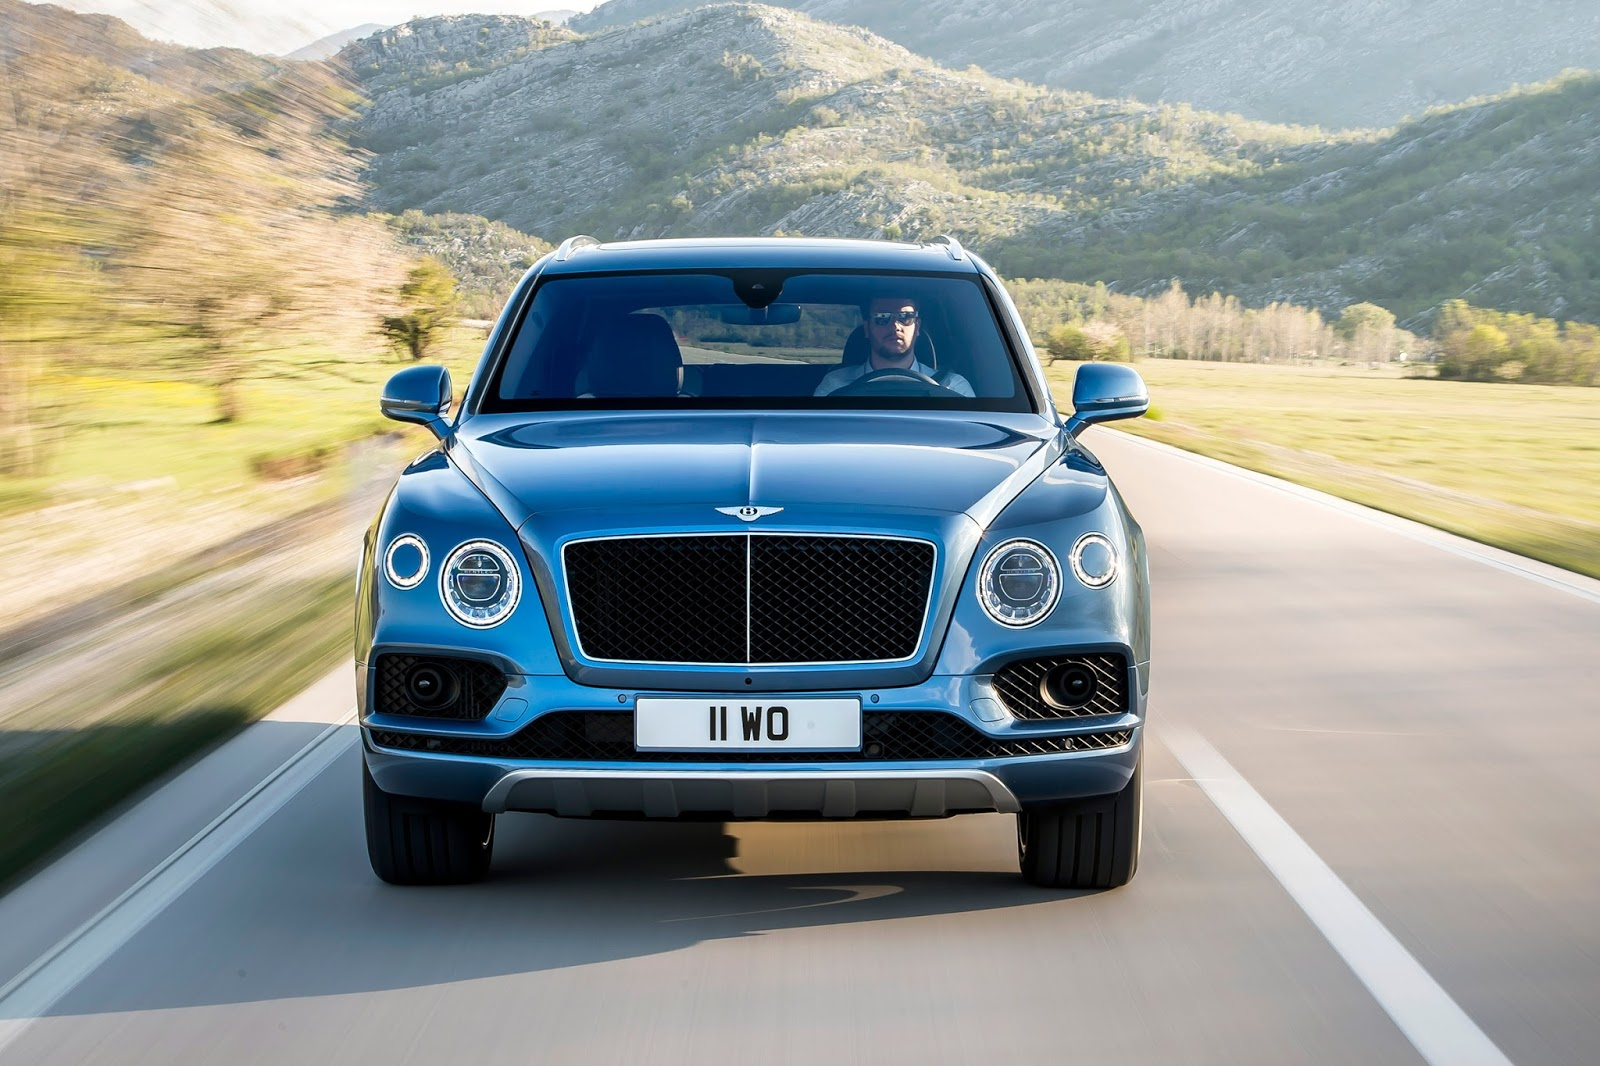 New Bentley Bentayga Diesel Is Britain\'s Posh Audi SQ7 And It Costs ...